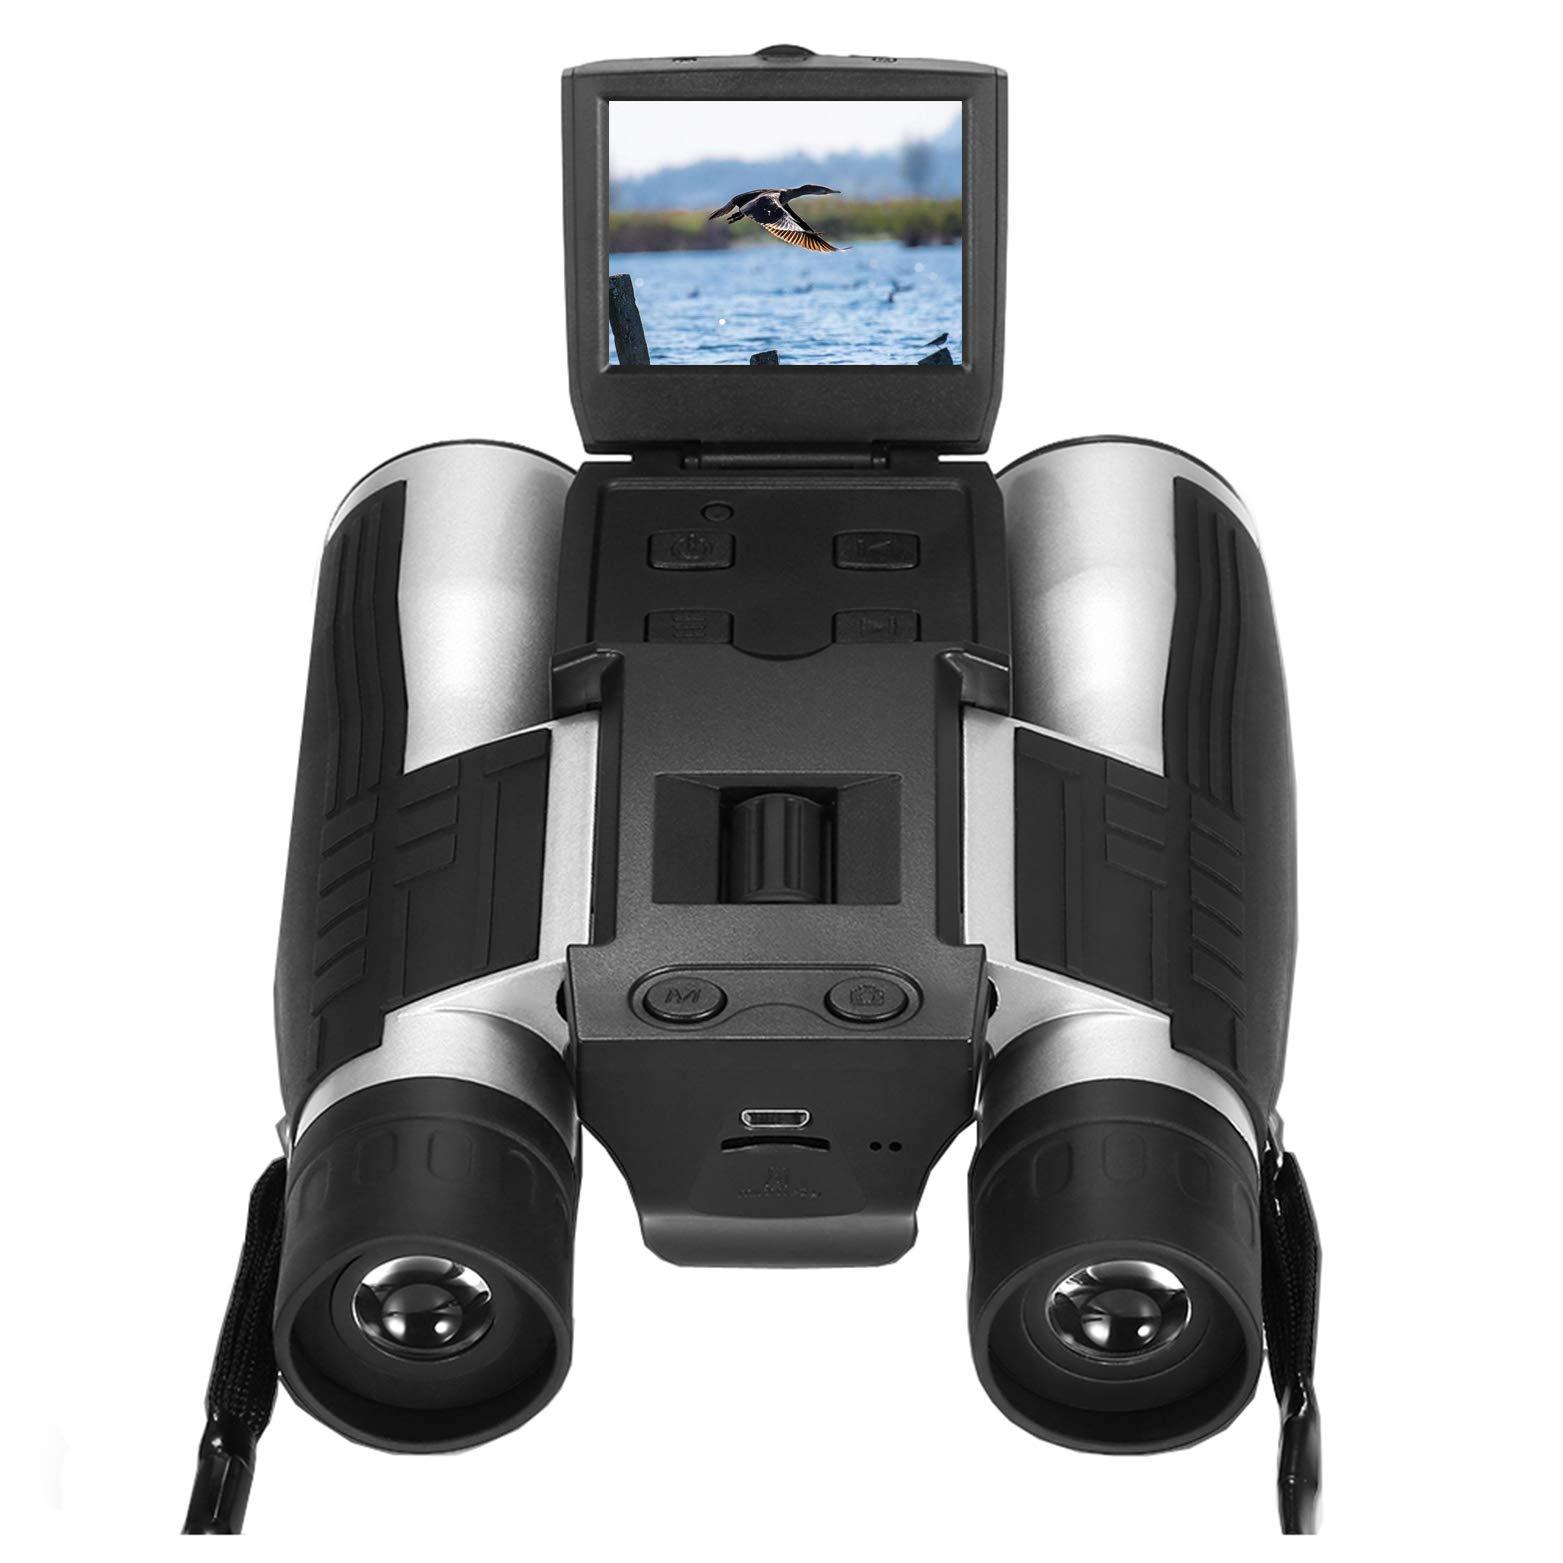 Vazussk 2'' HD Digital Binoculars Camera 12x32 5MP Video Photo Recorder for Bird Watching Football Game with 8GB TF Card by Vazussk